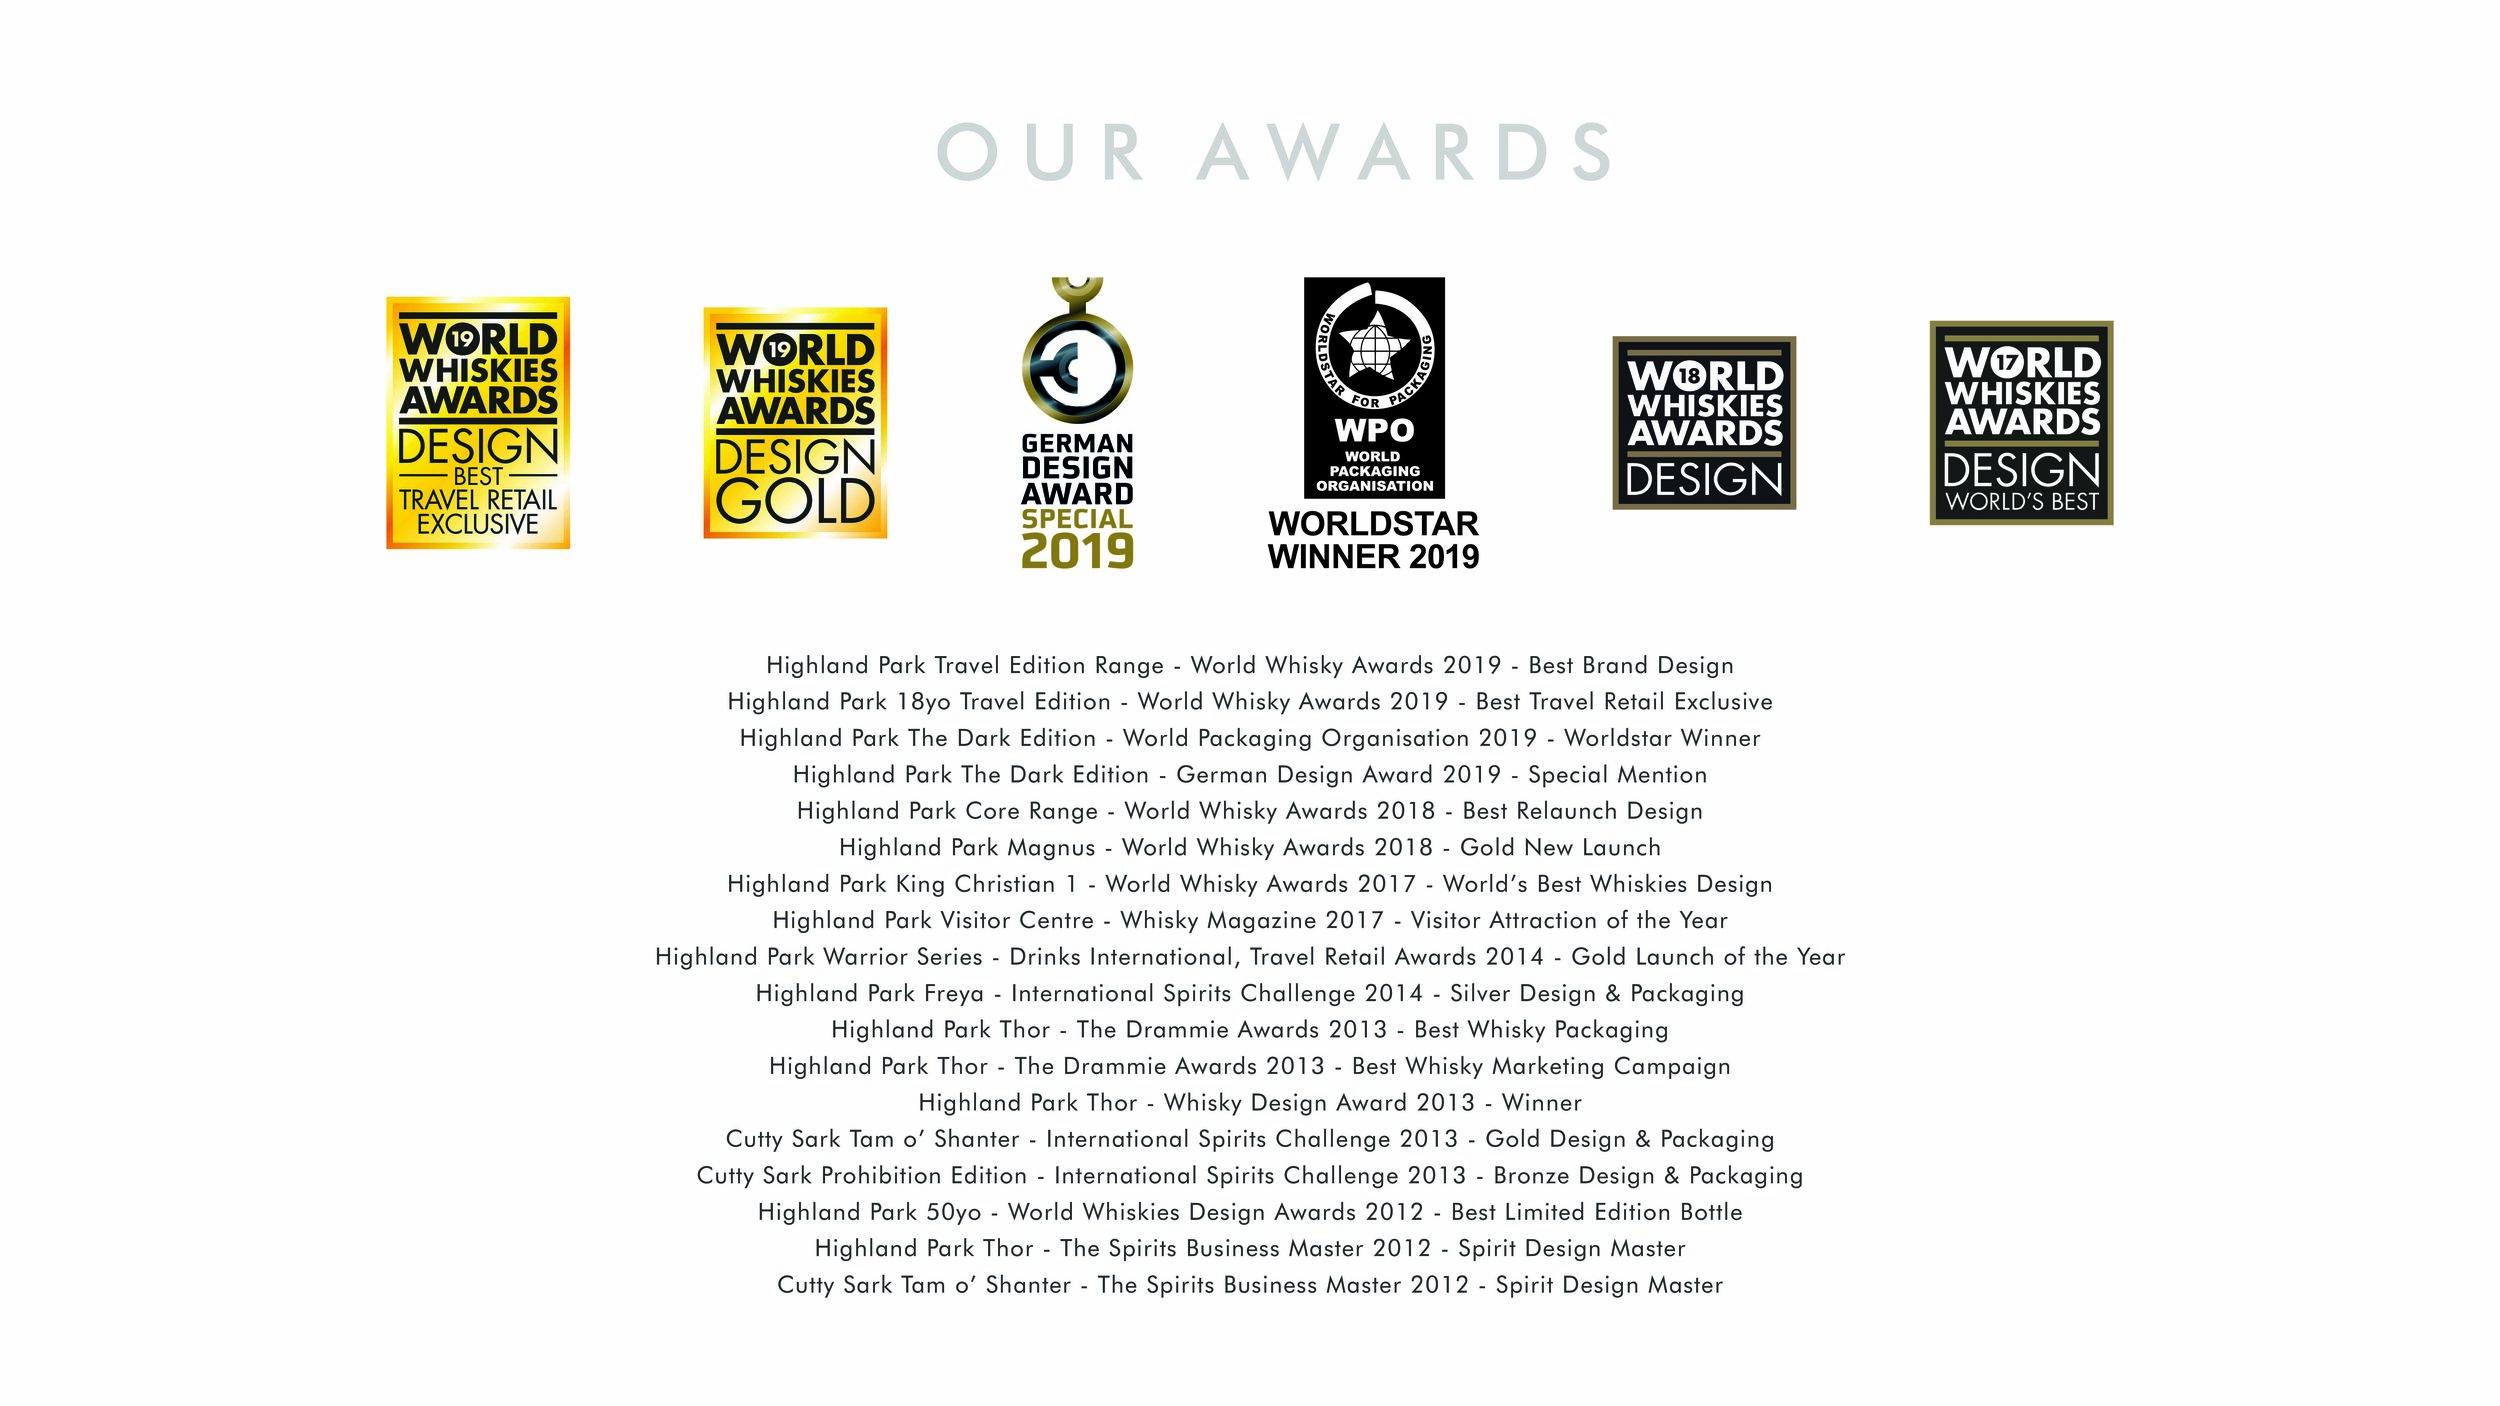 awards build layout.jpg